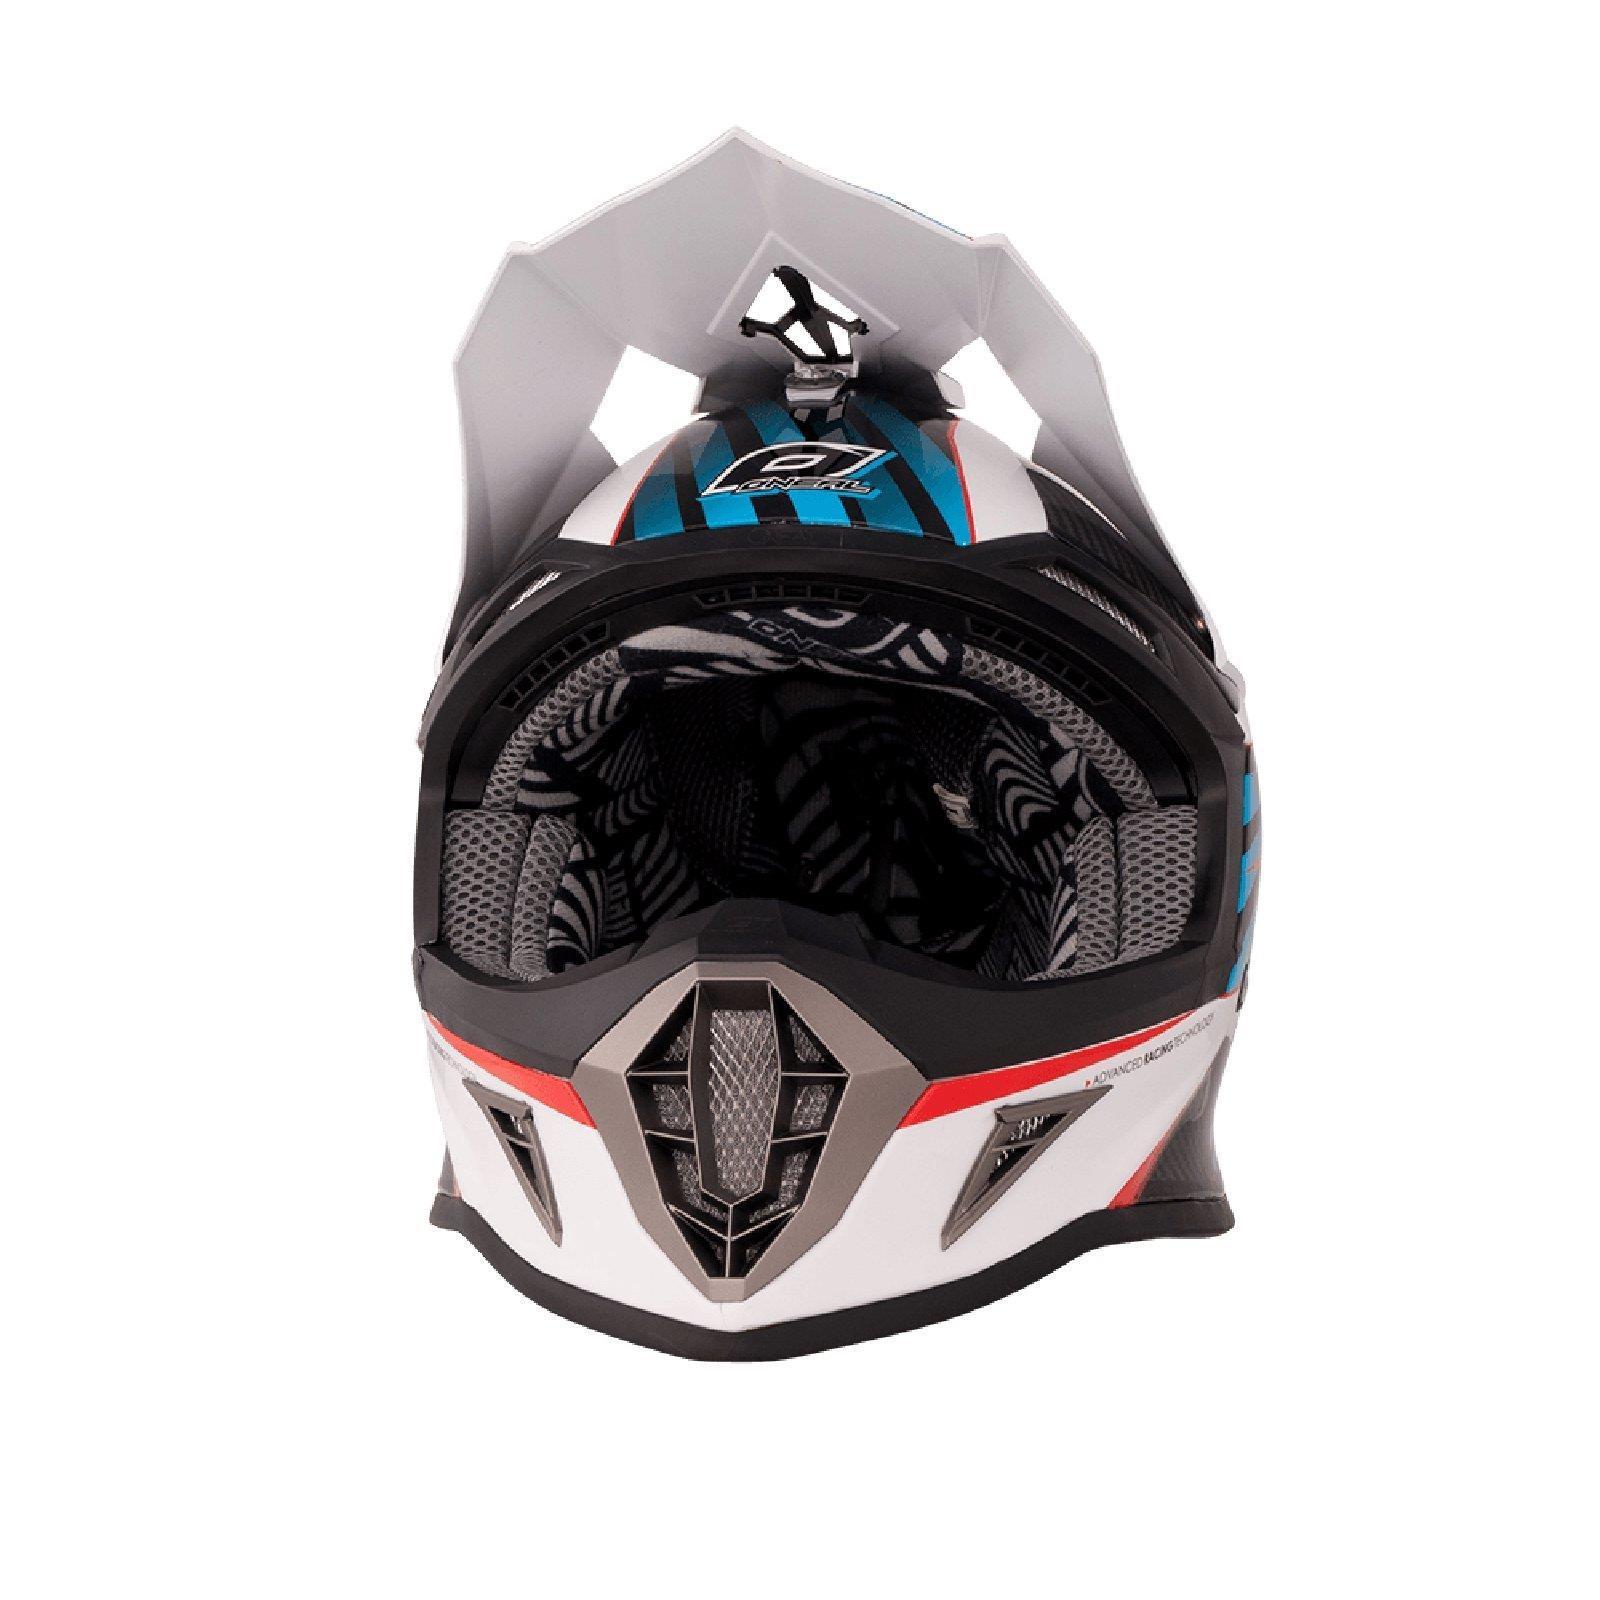 ONeal-Motocross-casco-MX-ENDURO-MOTO-BICI-FUORISTRADA-CROSS-Series-Adventure miniatura 111